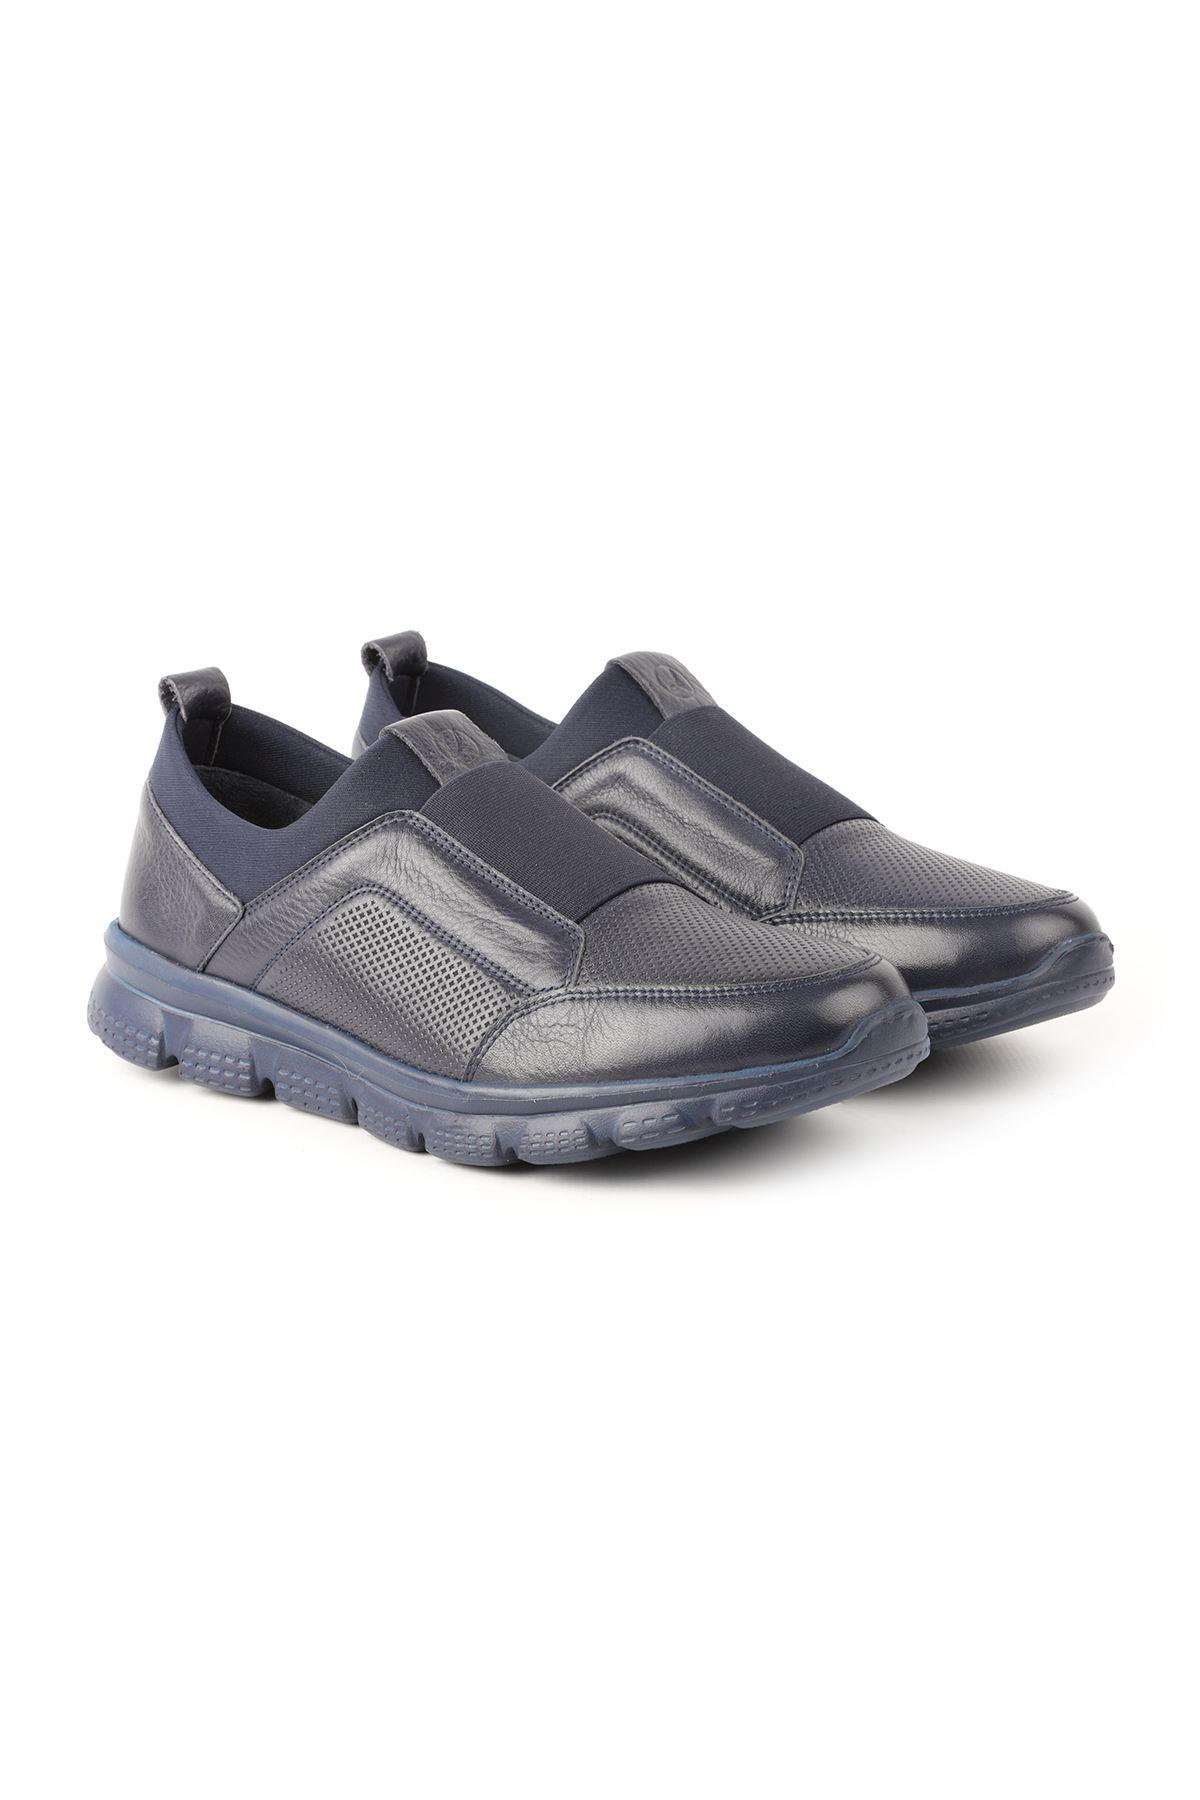 Libero L3625 Navy Blue Men Sport Shoes